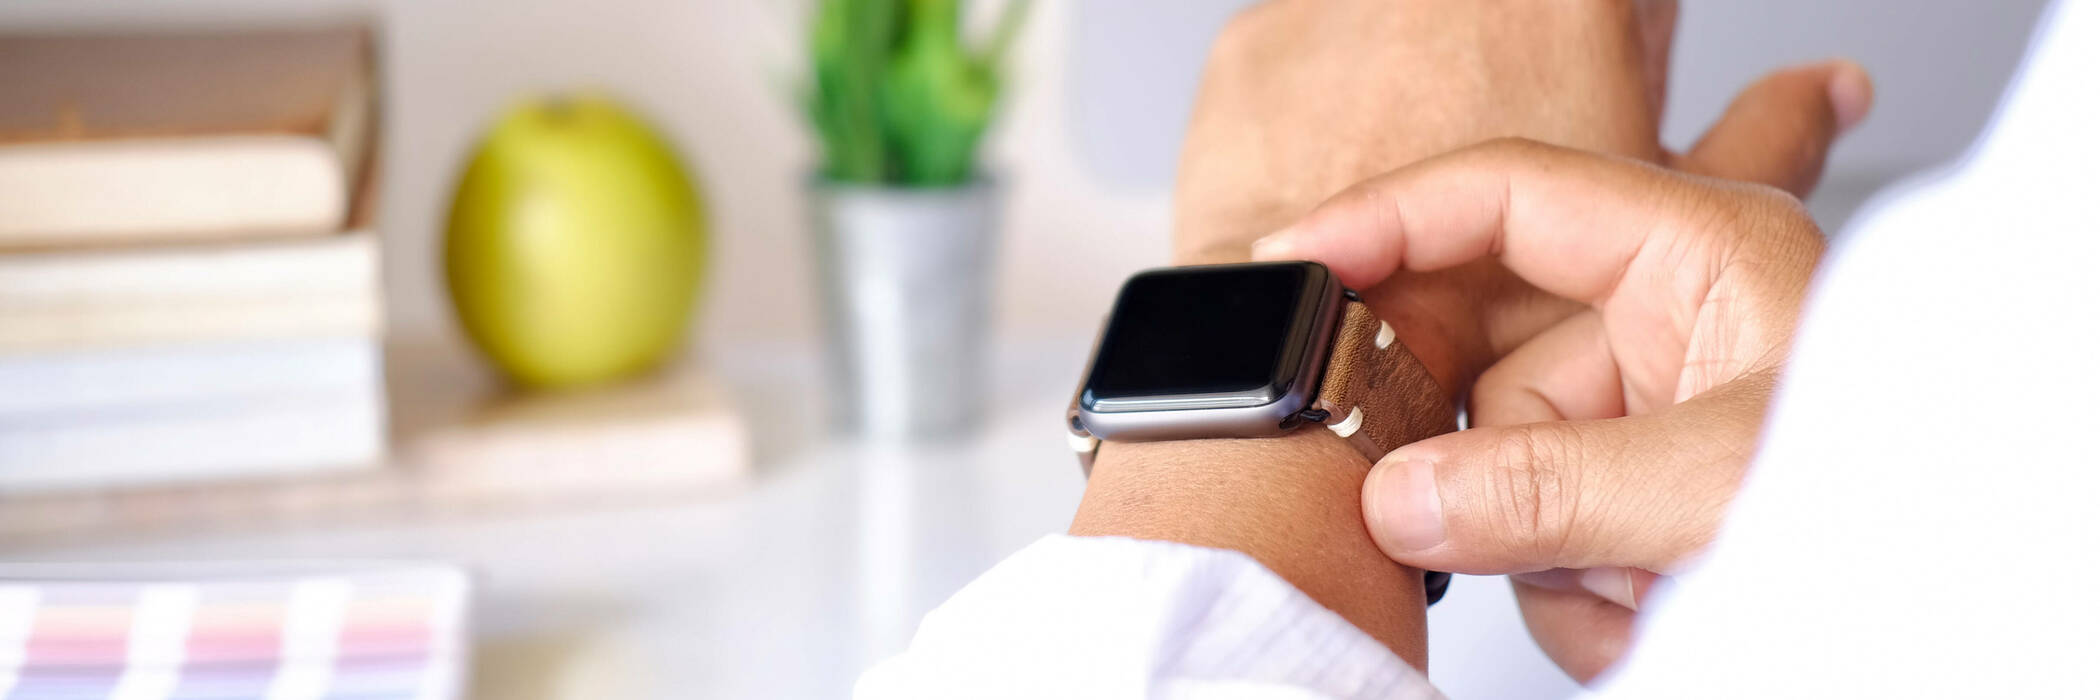 Man checking smartwatch